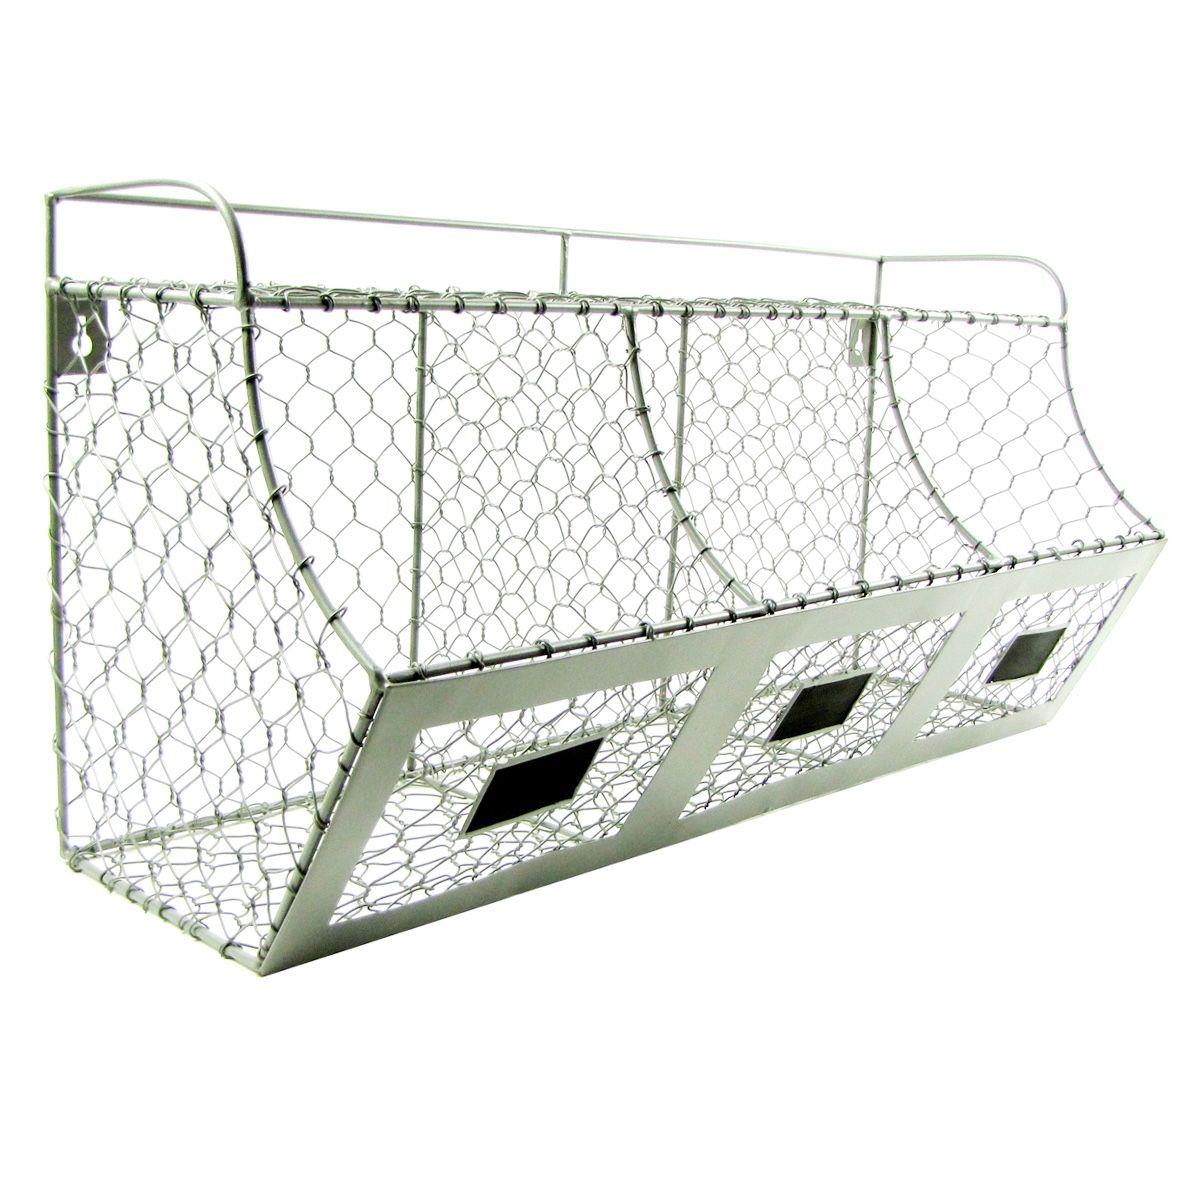 Rustic Chicken Wire Wall Storage 3 Bin Basket Primitive Country ...